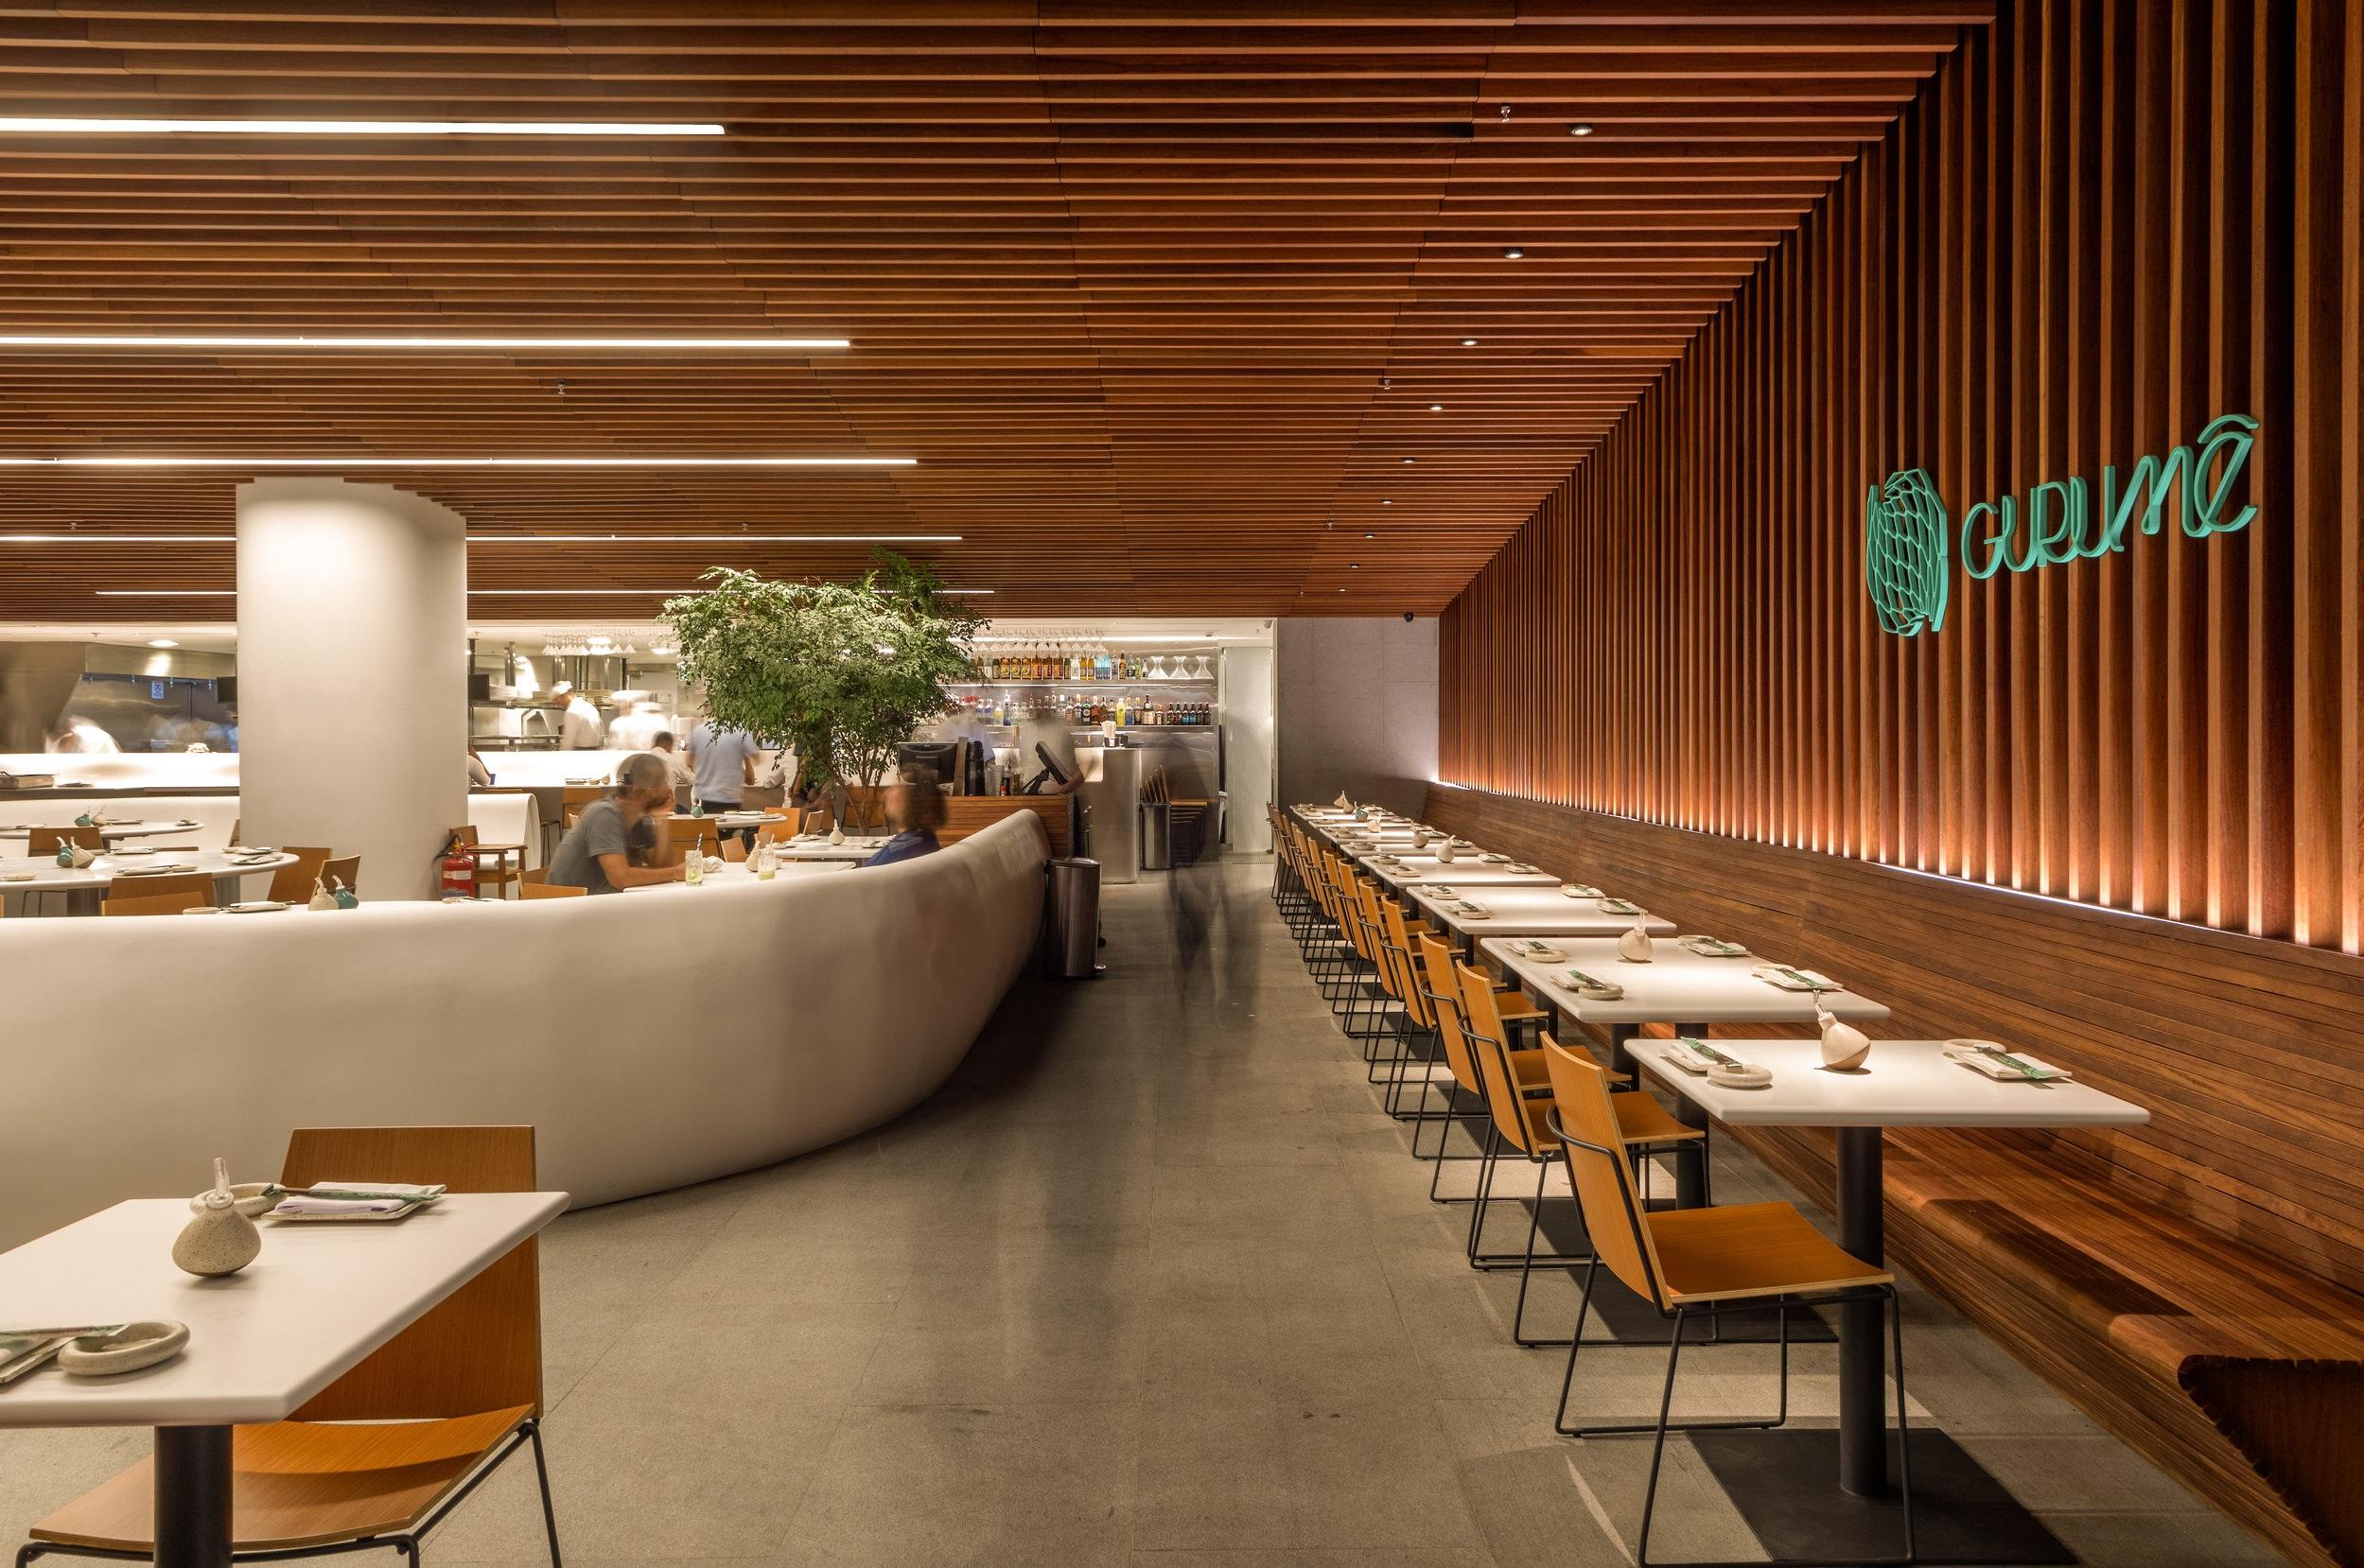 LIGHTSOURCE_Restaurante-Gurume-2019_Bernardes-Arquitetura_Studio-iluz_004.jpg